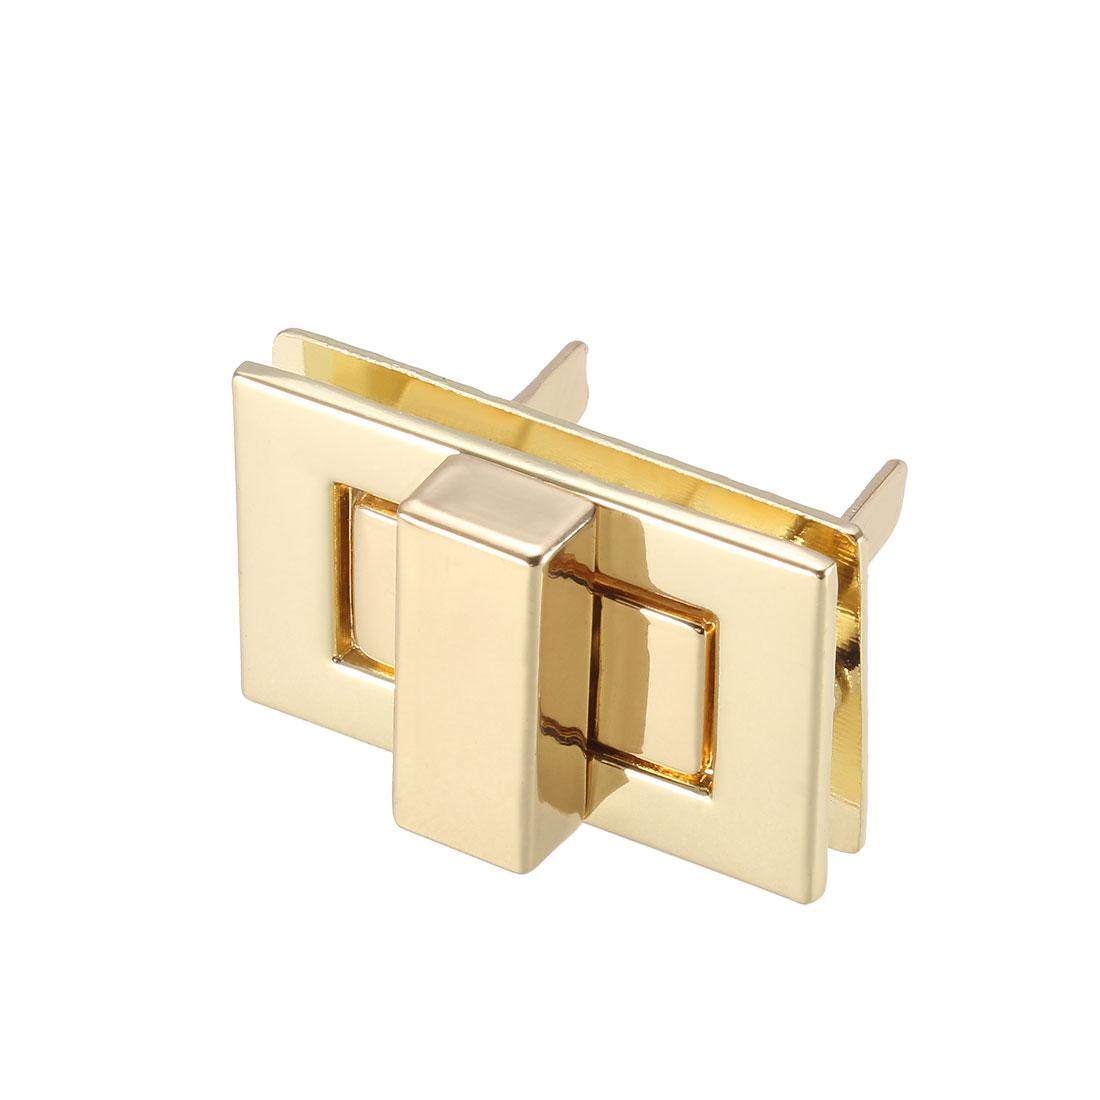 1 Set Rectangular Purses Twist Lock 32mm x 20mm Clutches Closures - Light Gold